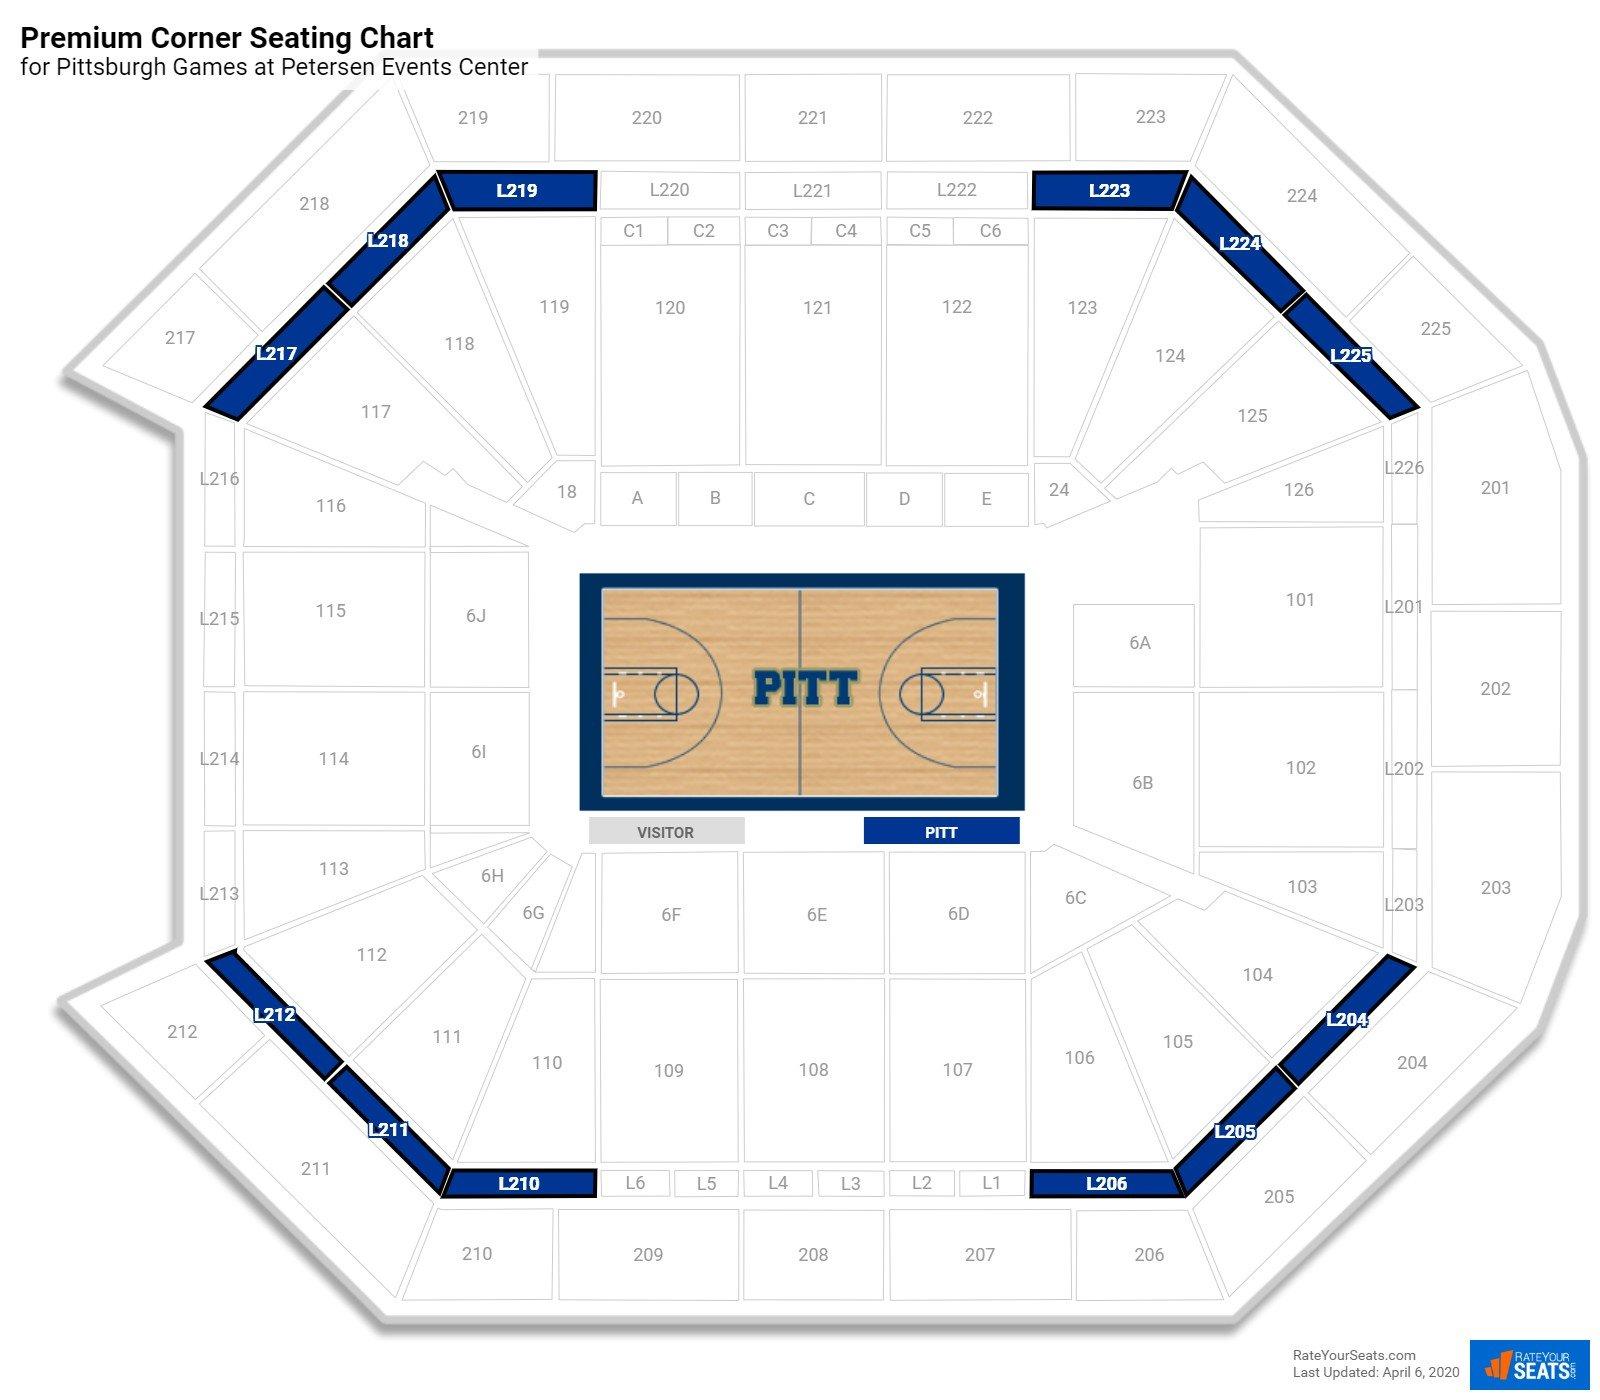 Petersen Events Center Premium Corner Seating Chart